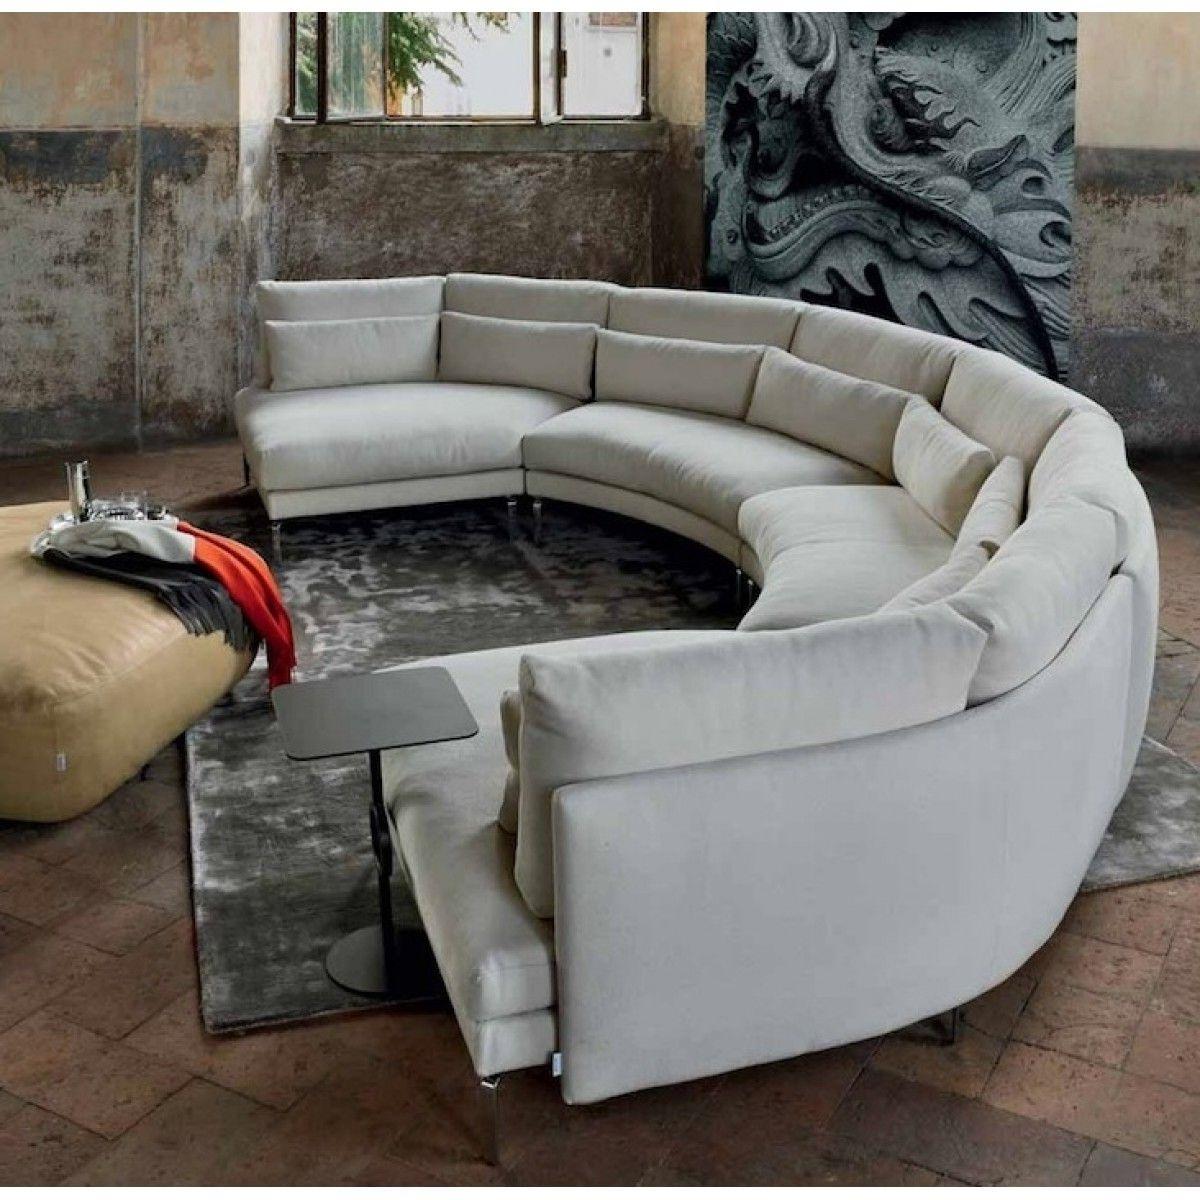 2018 Semicircular Sofas For Pindaniel Harper On Decor (View 3 of 15)